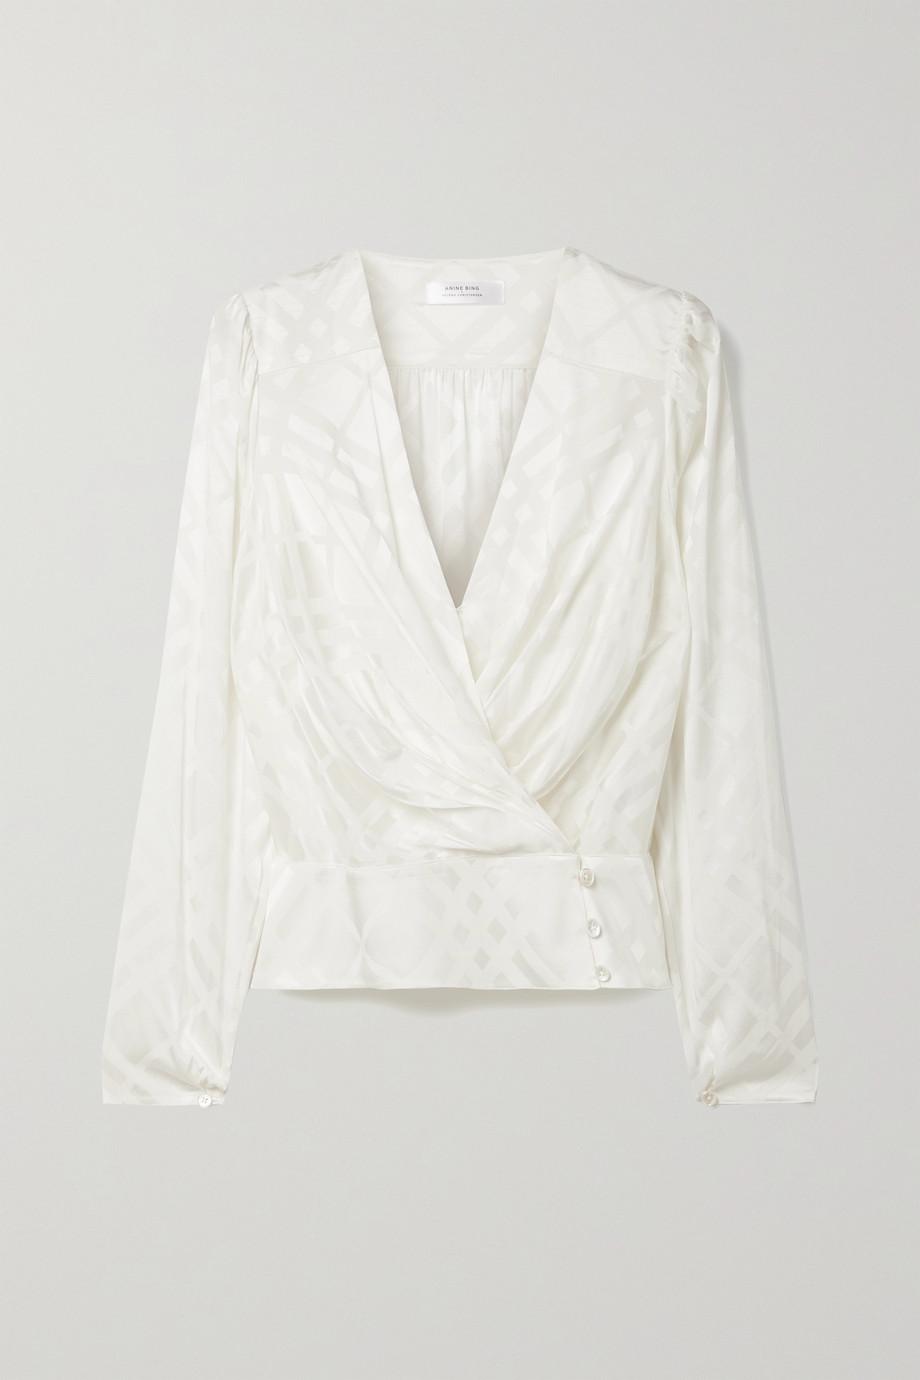 Anine Bing + Helena Christensen June silk-blend satin-jacquard wrap top